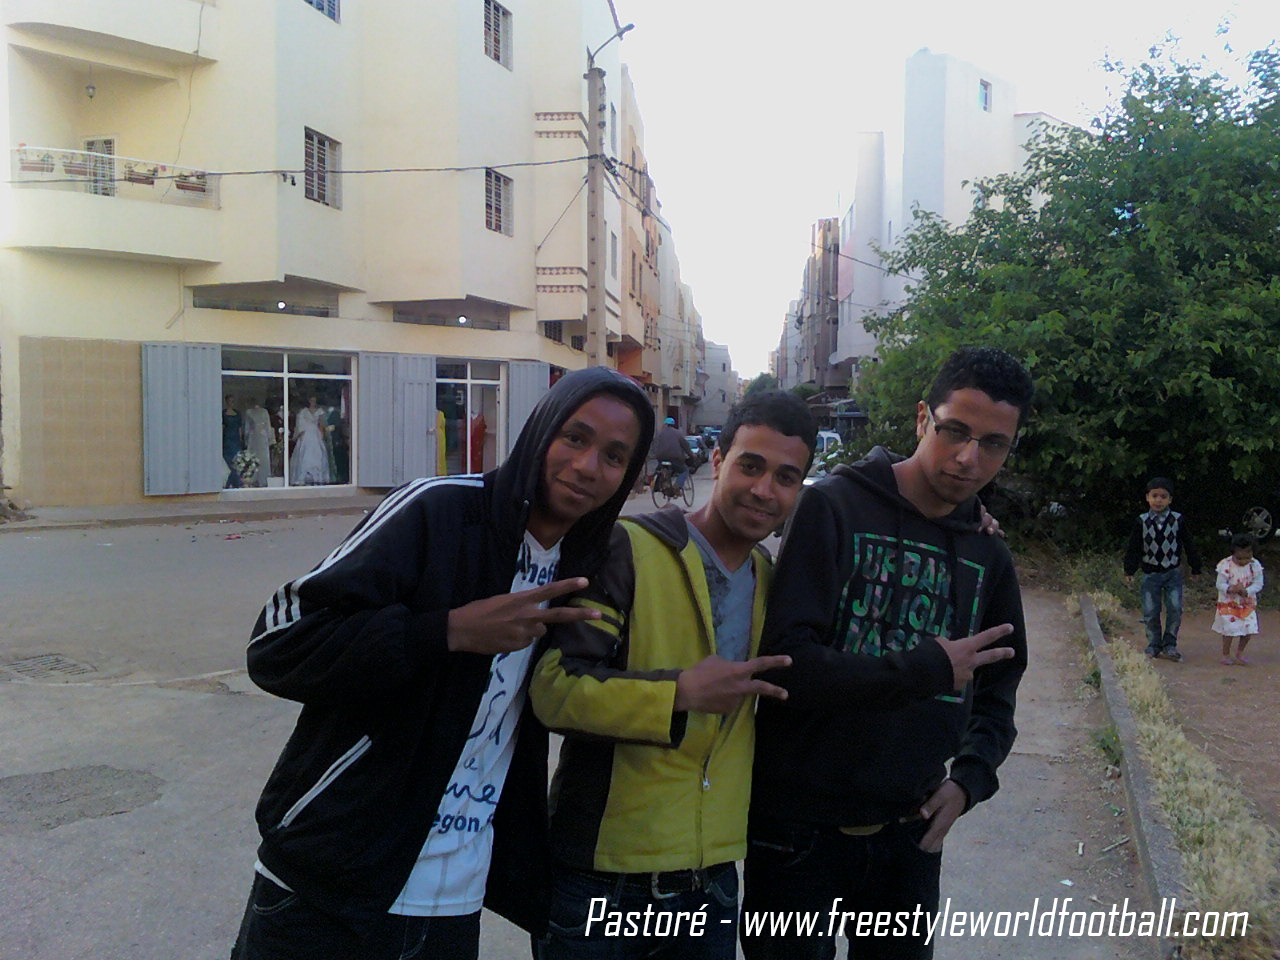 Pastoré - 005 - www.freestyleworldfootball.com.jpg